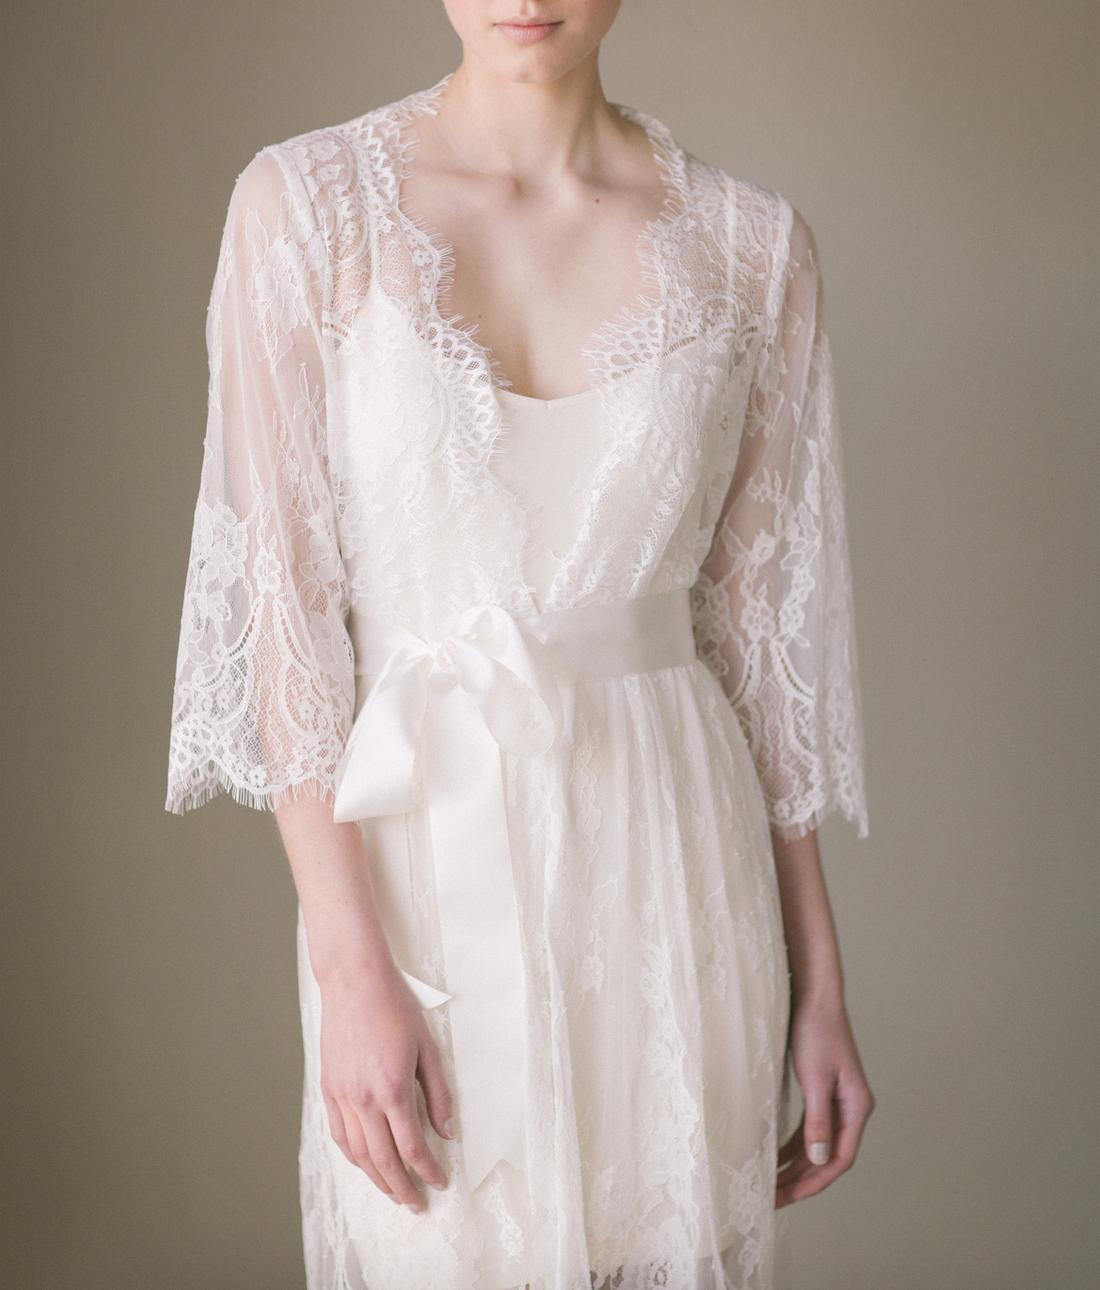 Undergarments for lace wedding dress  Bridal Lace Robe Kimono Isabella  Pijamas  Pinterest  Robe